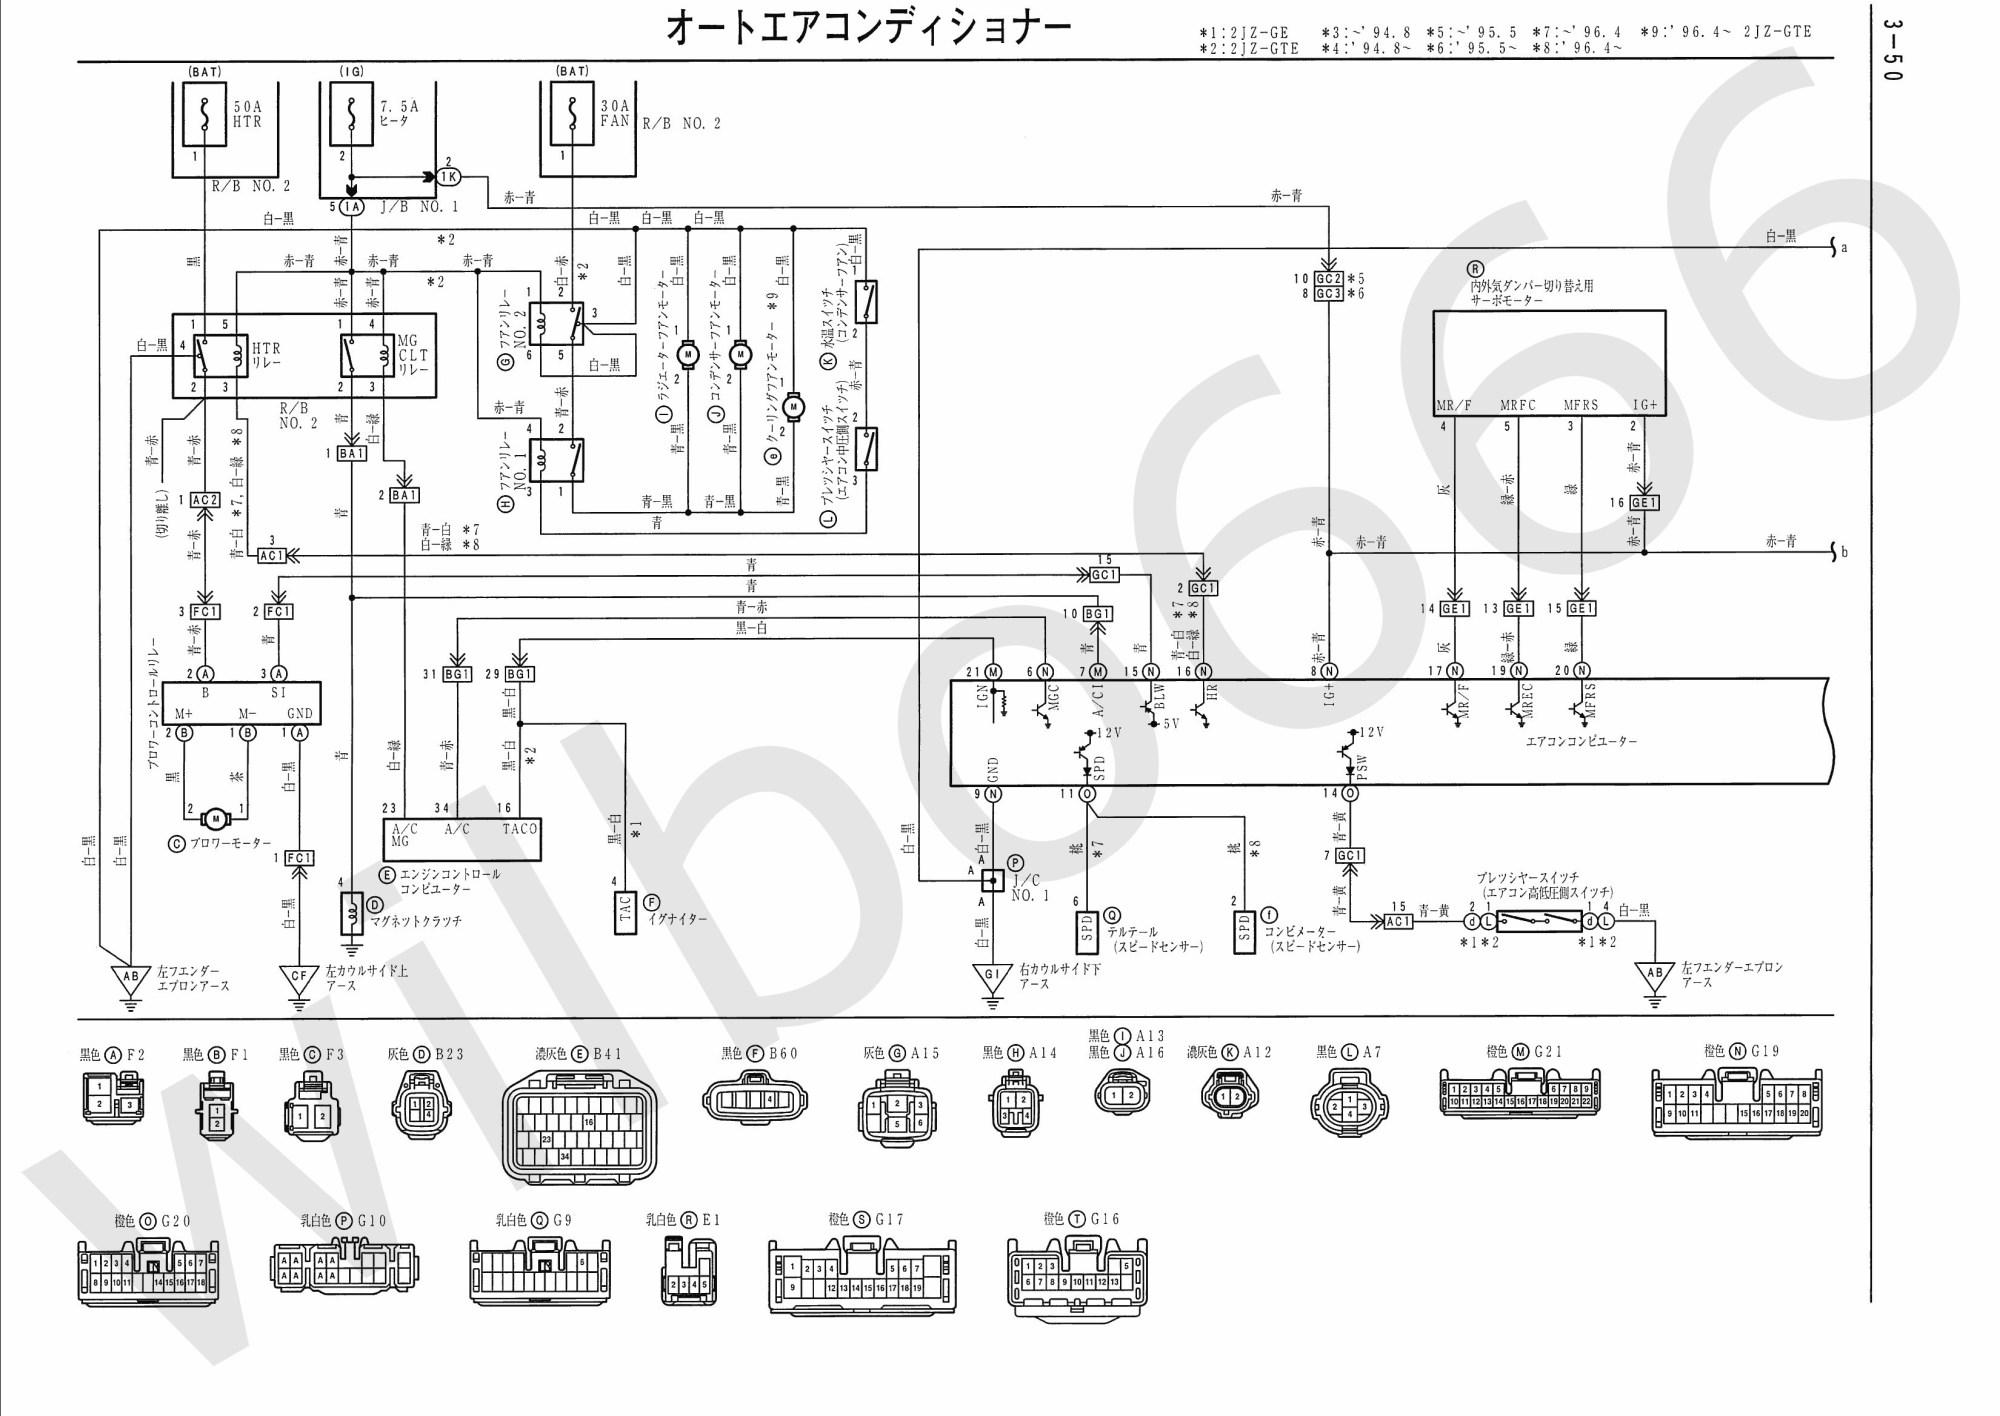 hight resolution of obd1 engine harness diagram honda obd2 wire harness diagram inspirational obd1 alternator wiring of obd1 engine